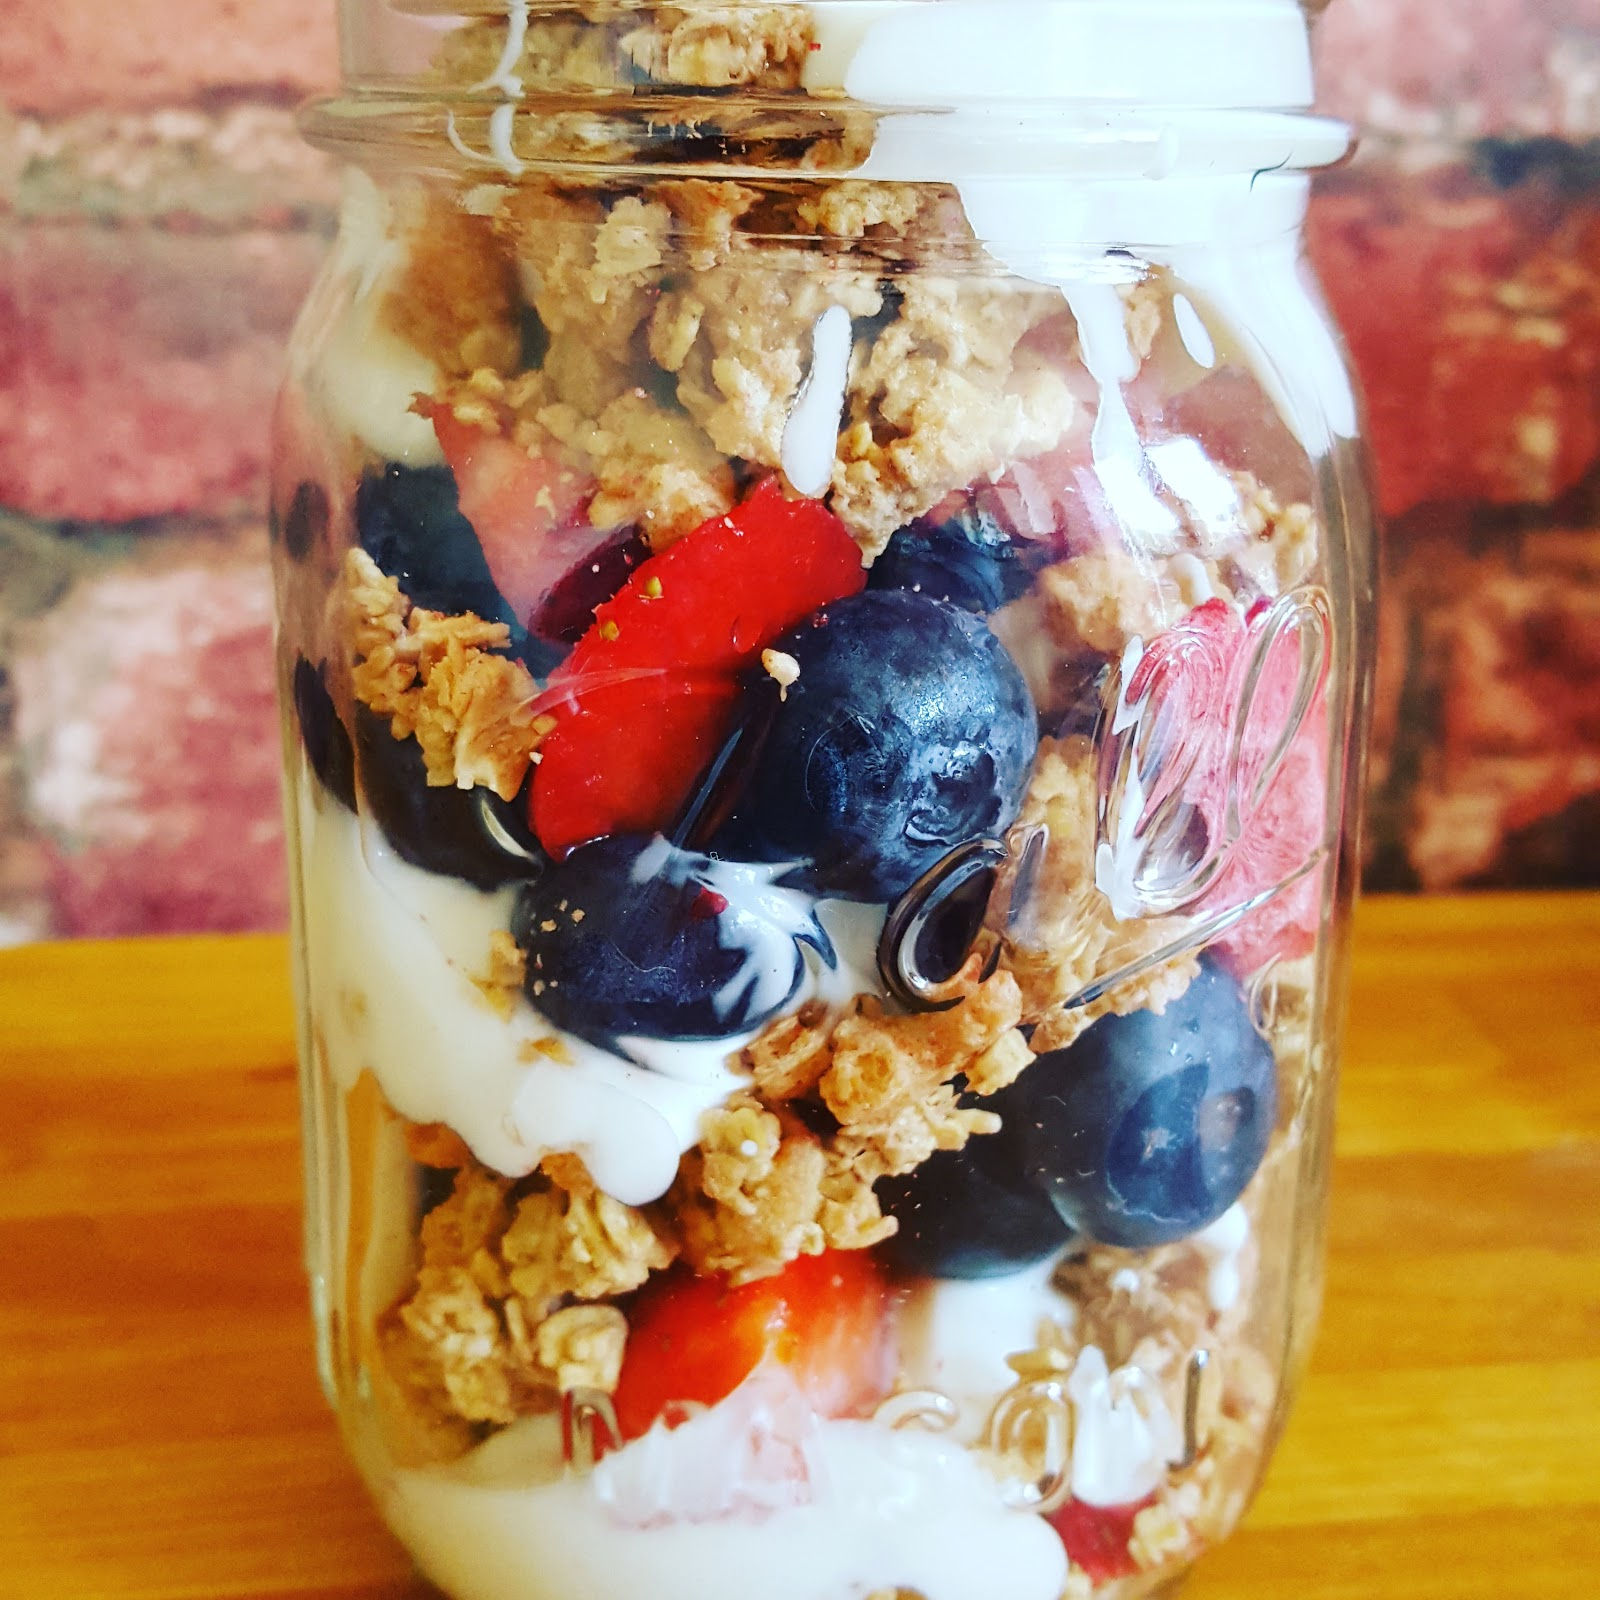 Granola, Berries And Yogurt Parfaits For Parfaits Day